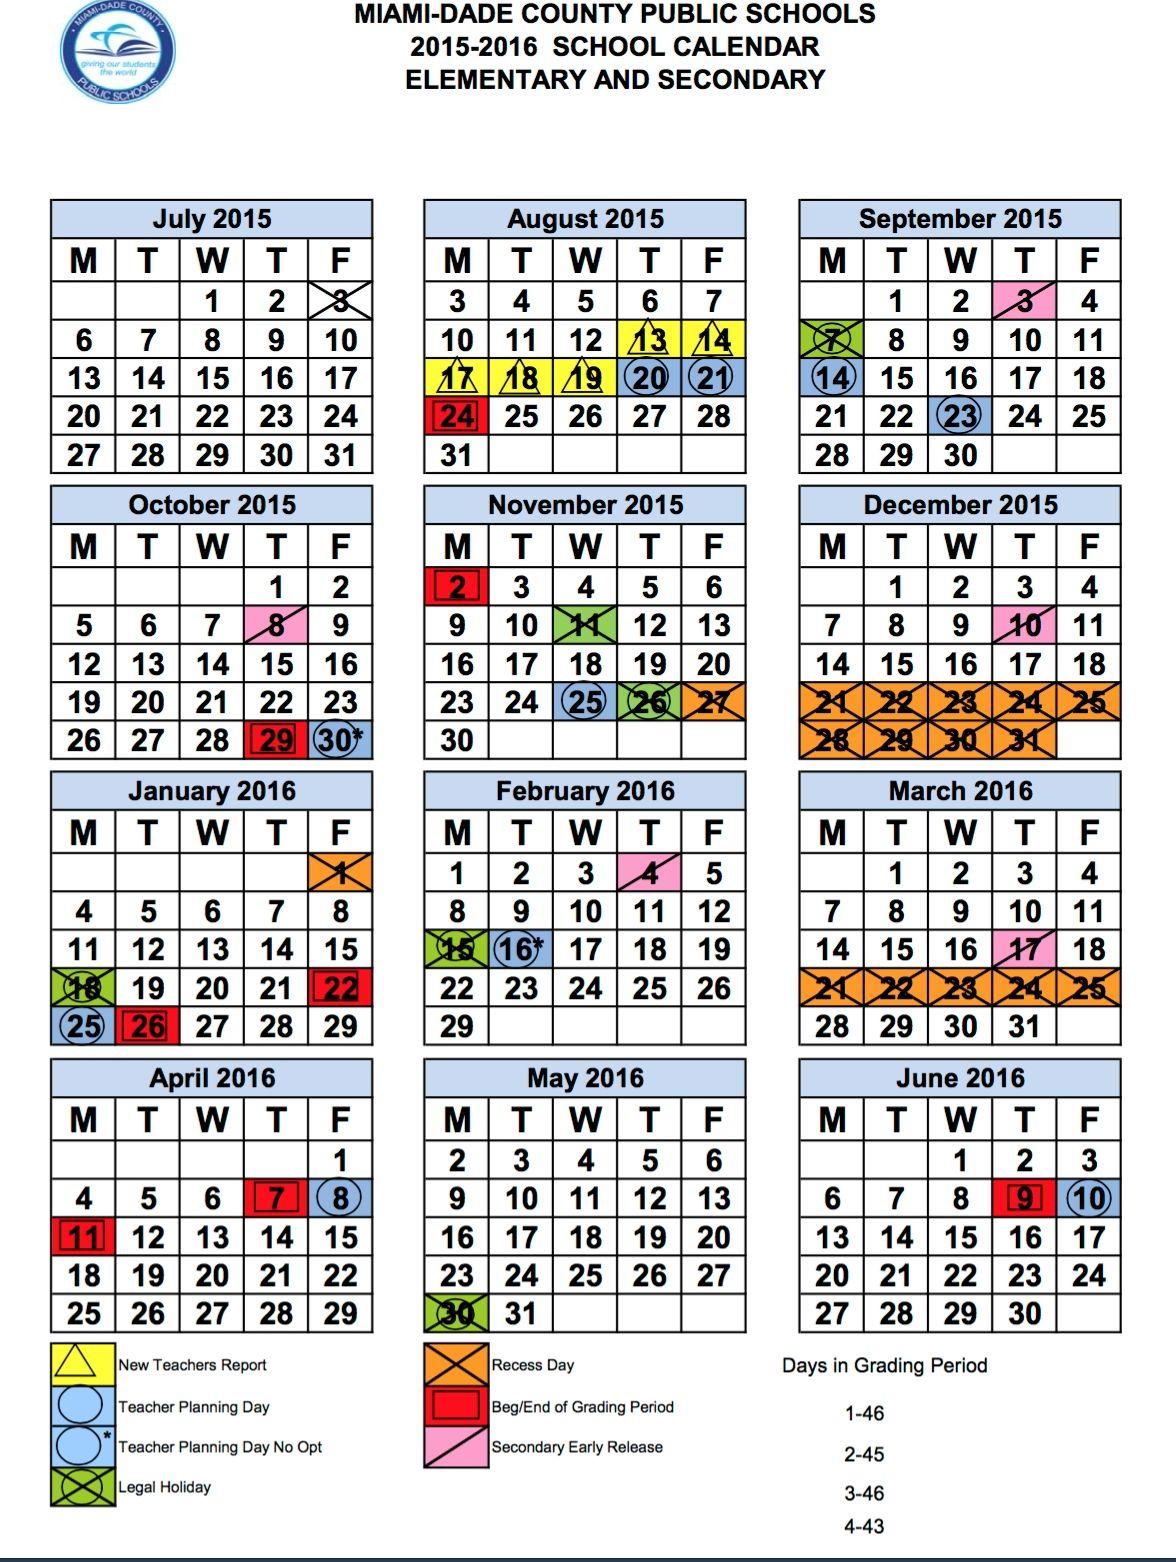 Exceptional Calendar School Year Miami Dade School Calendar Homeschool Calendar High School Calendar